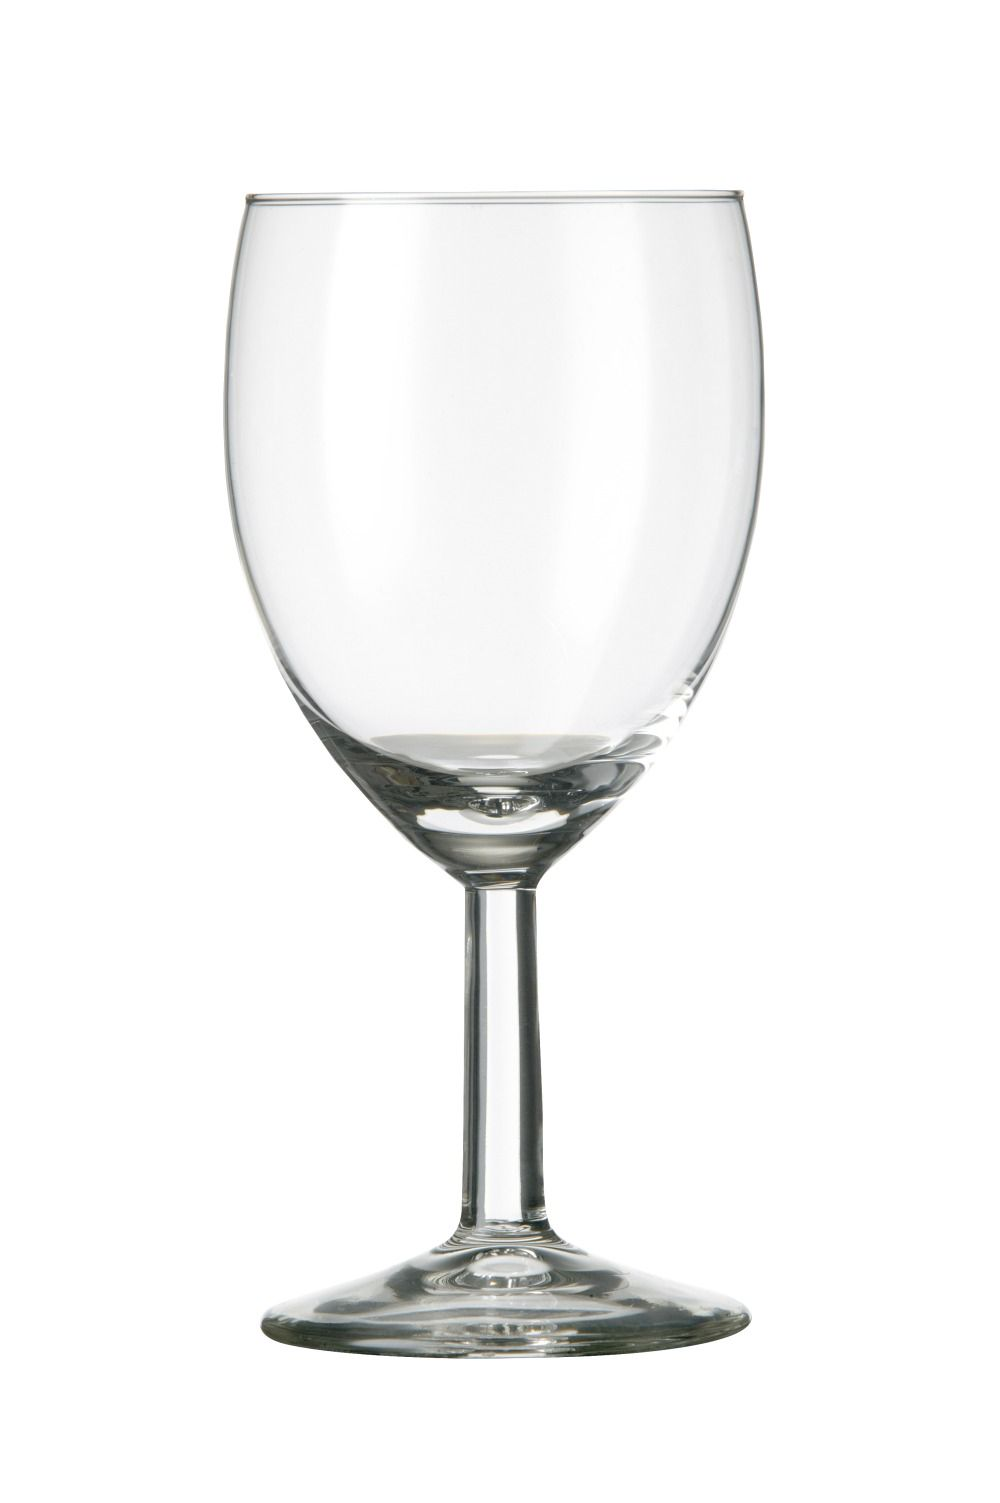 royal_leerdam_wijnglas_gilde_24cl.jpg